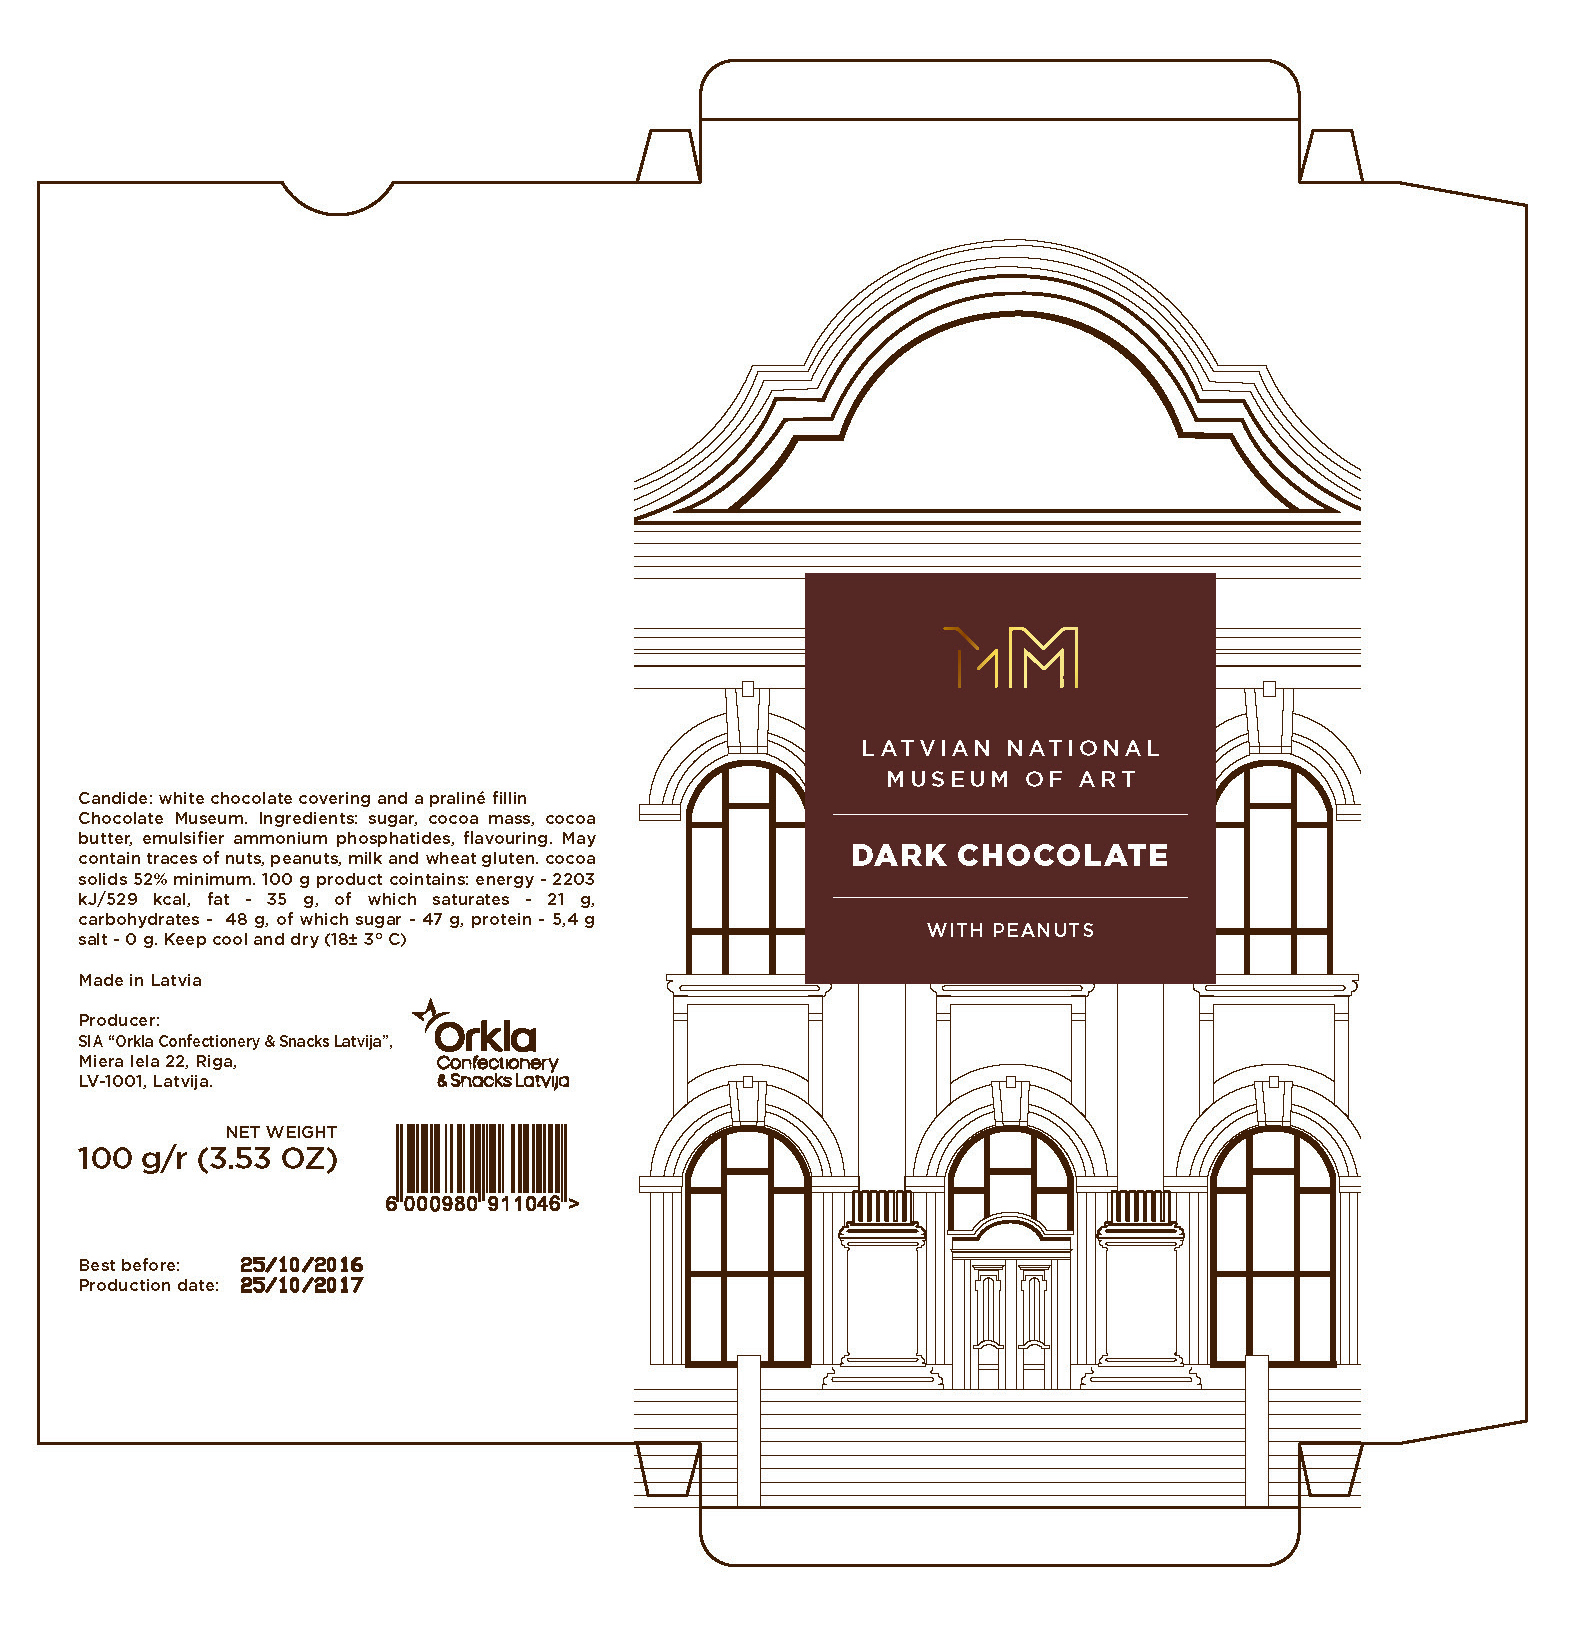 https://i2.wp.com/www.lokrazyplus.com/wp-content/uploads/2017/03/ChocolateBar-Design-LOK_Page_2.jpg?fit=1588%2C1637&ssl=1